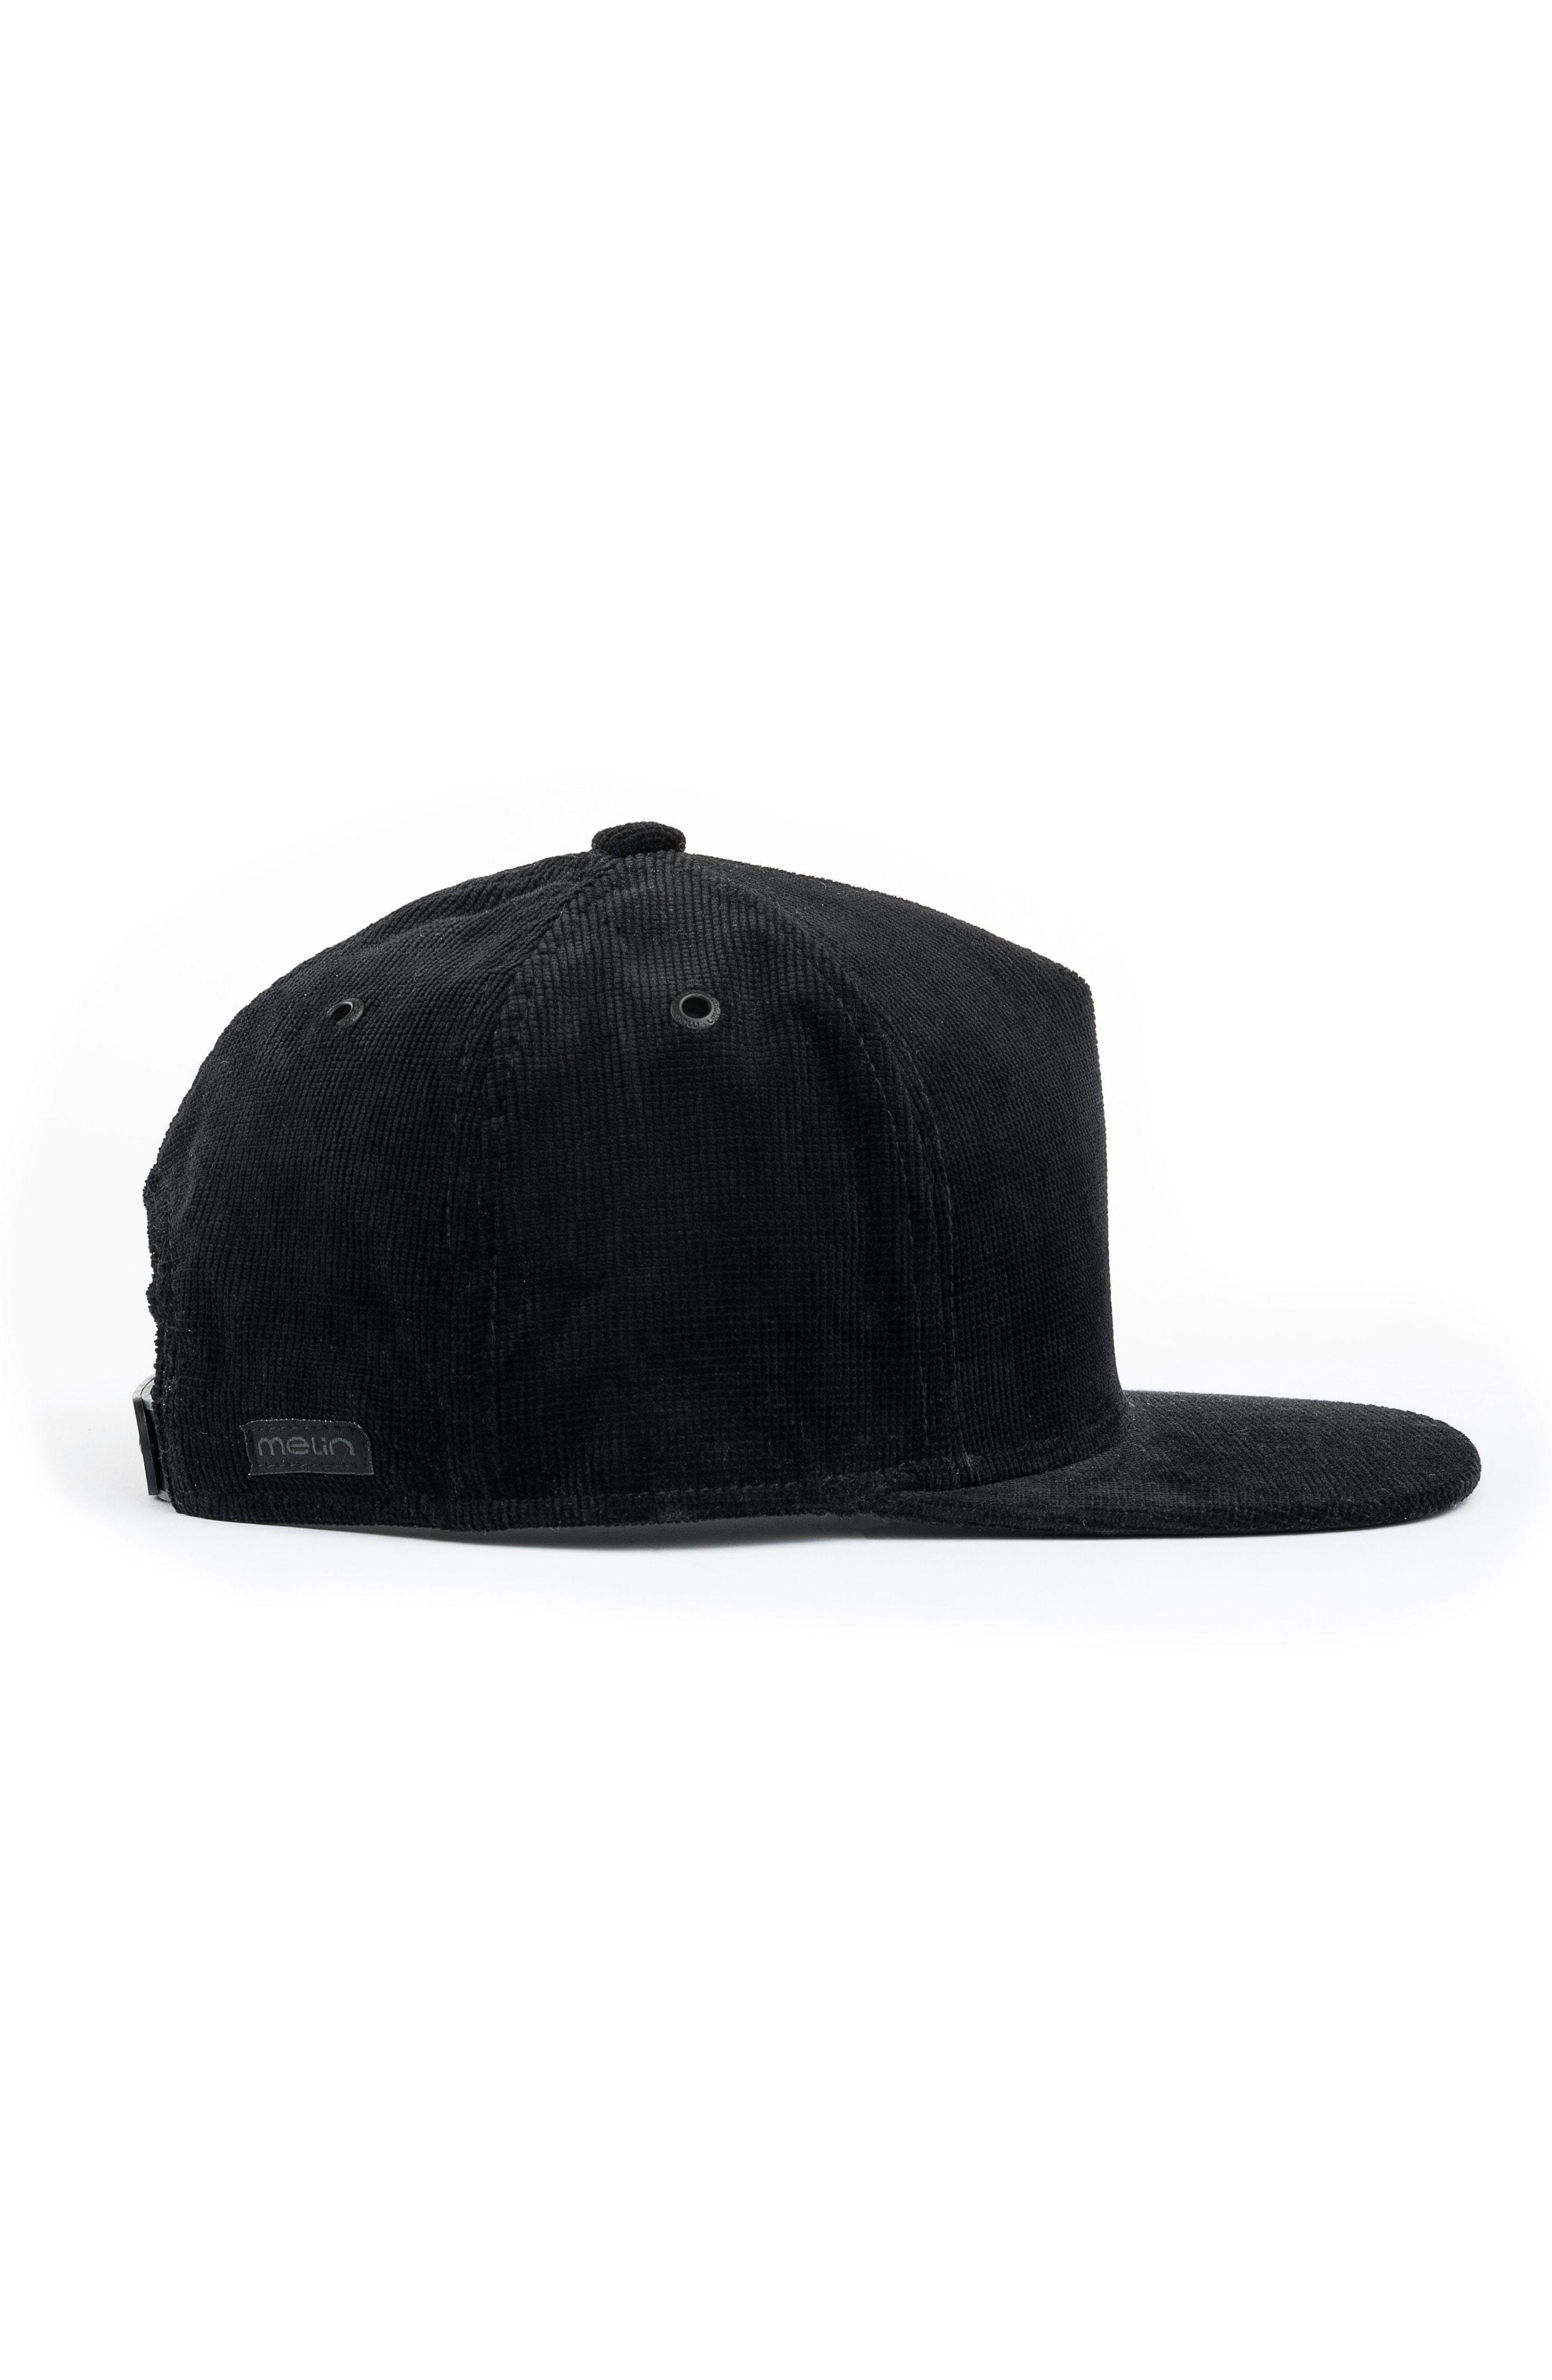 brand new 41942 0d3ac Melin The Stealth Snapback Baseball Cap - Black